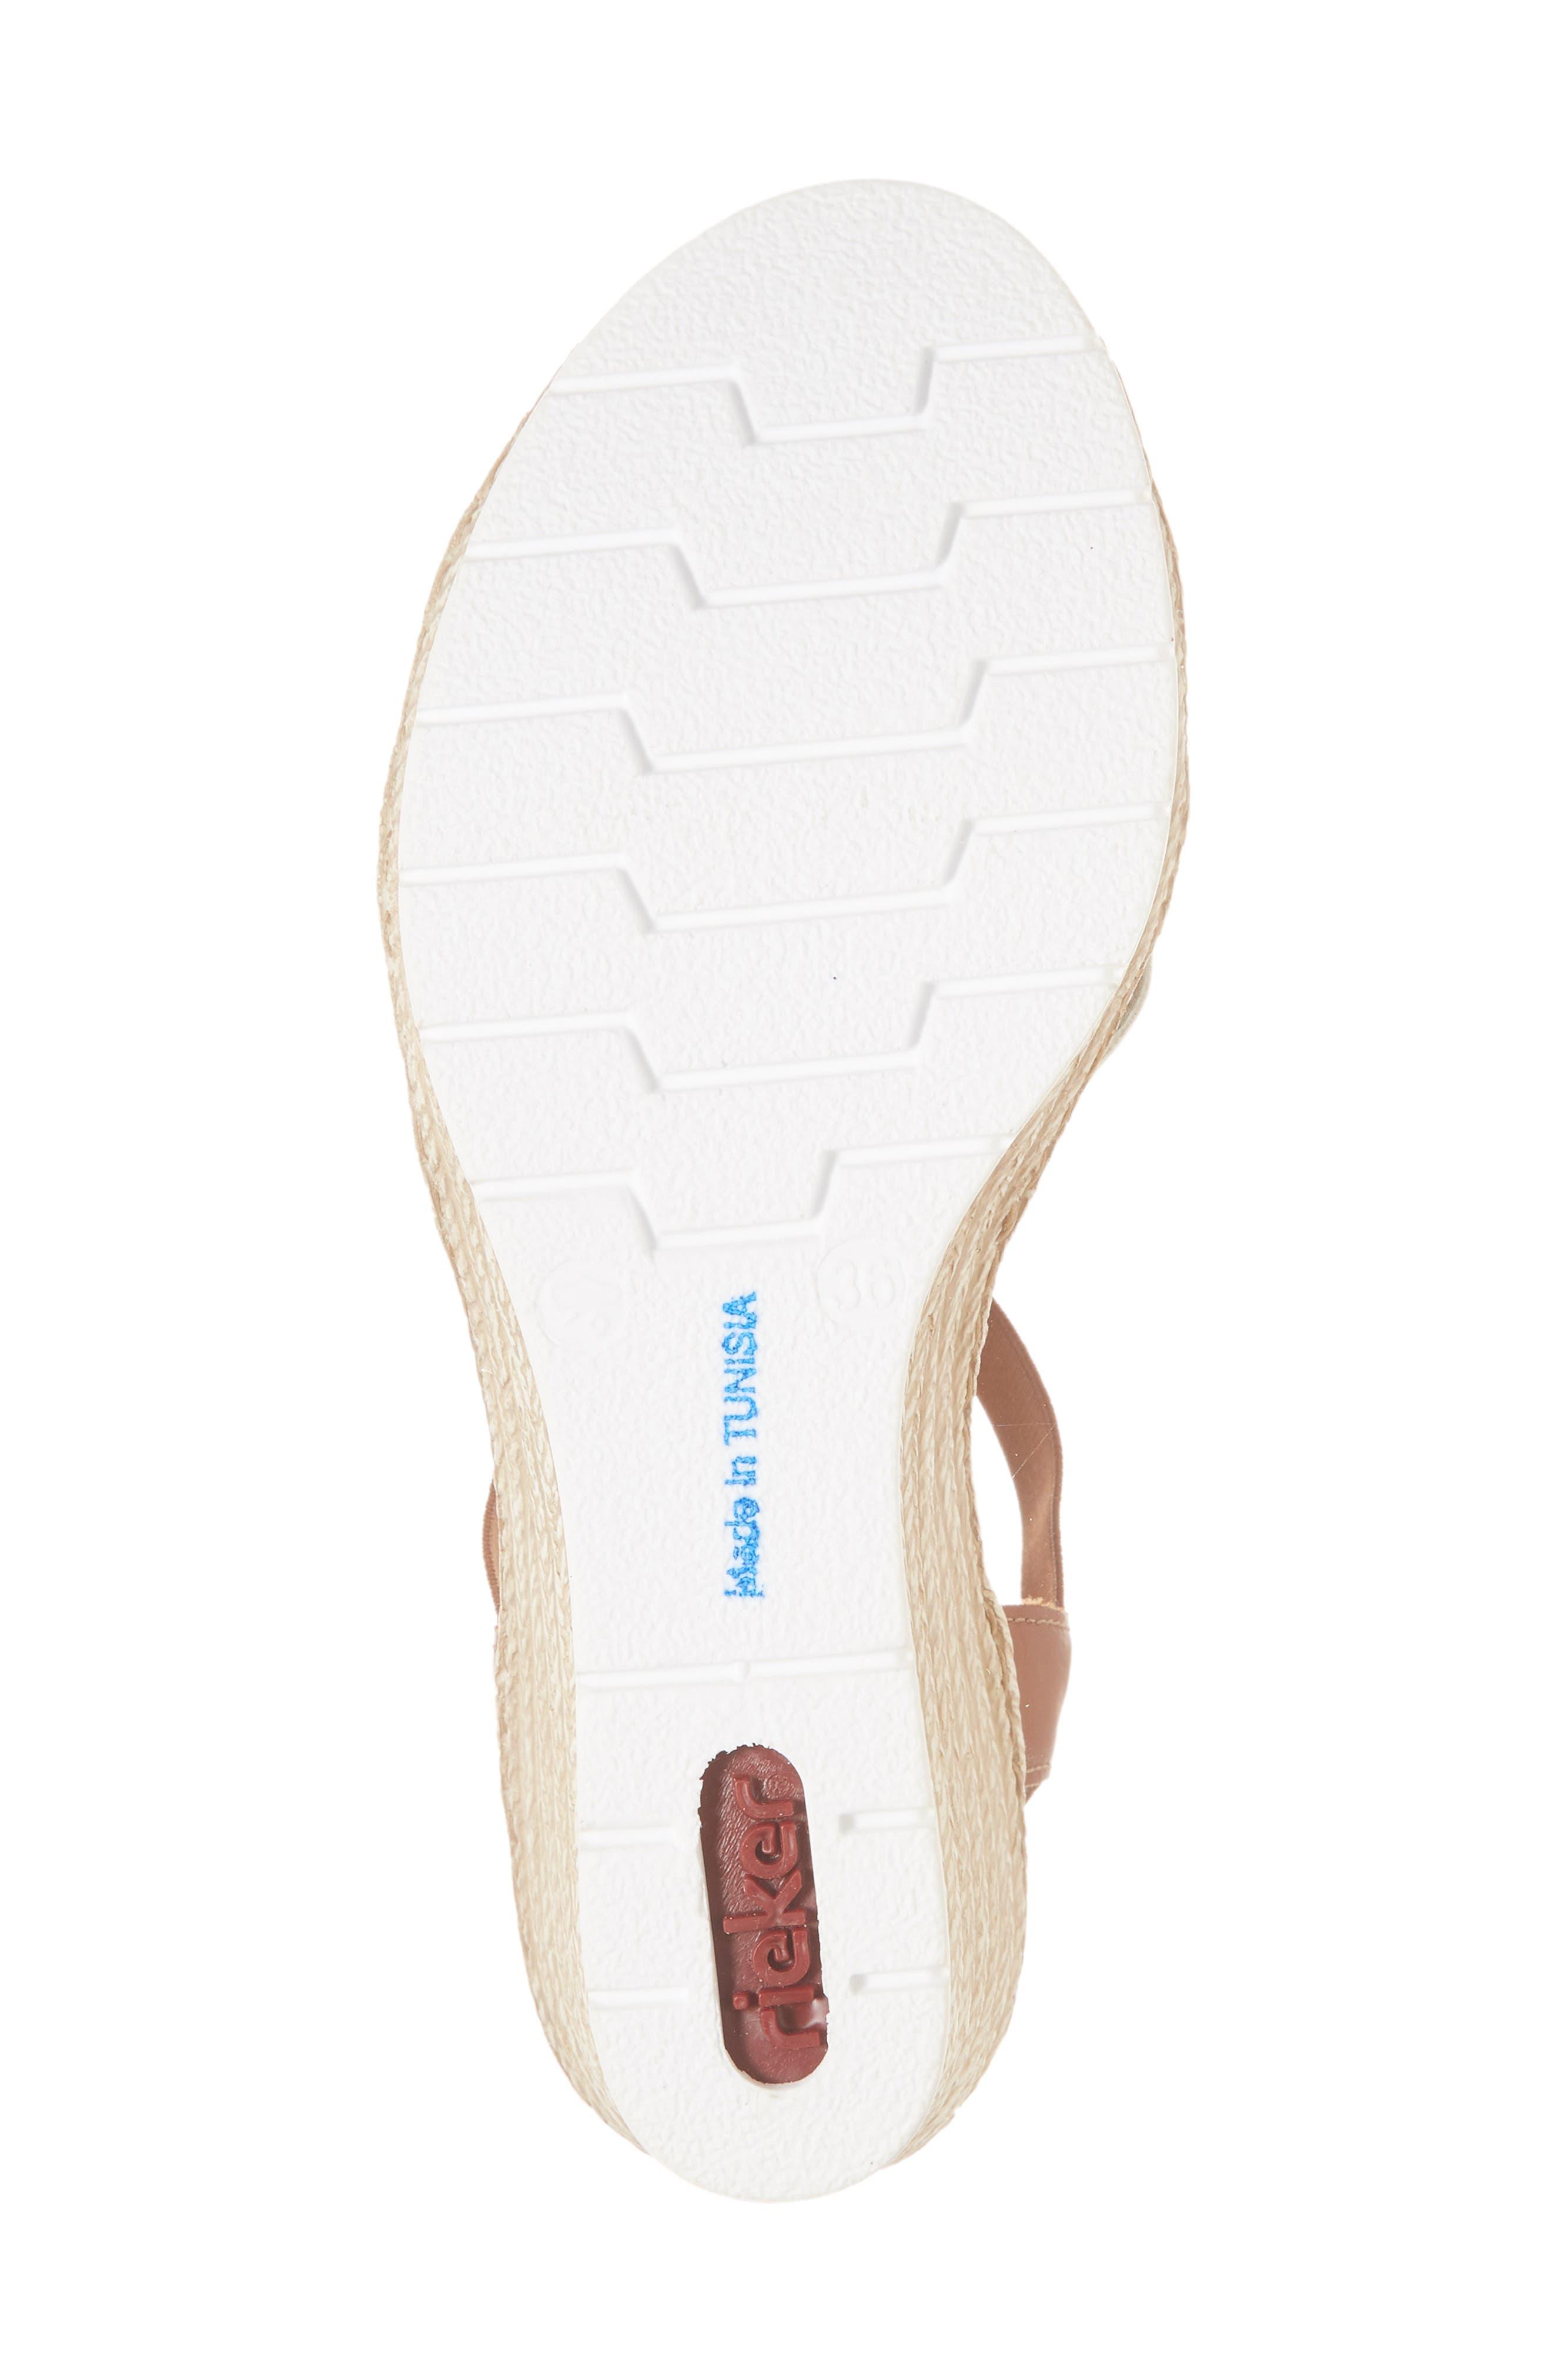 RIEKER ANTISTRESS, Fanni 95 Espadrille Wedge Sandal, Alternate thumbnail 6, color, 217